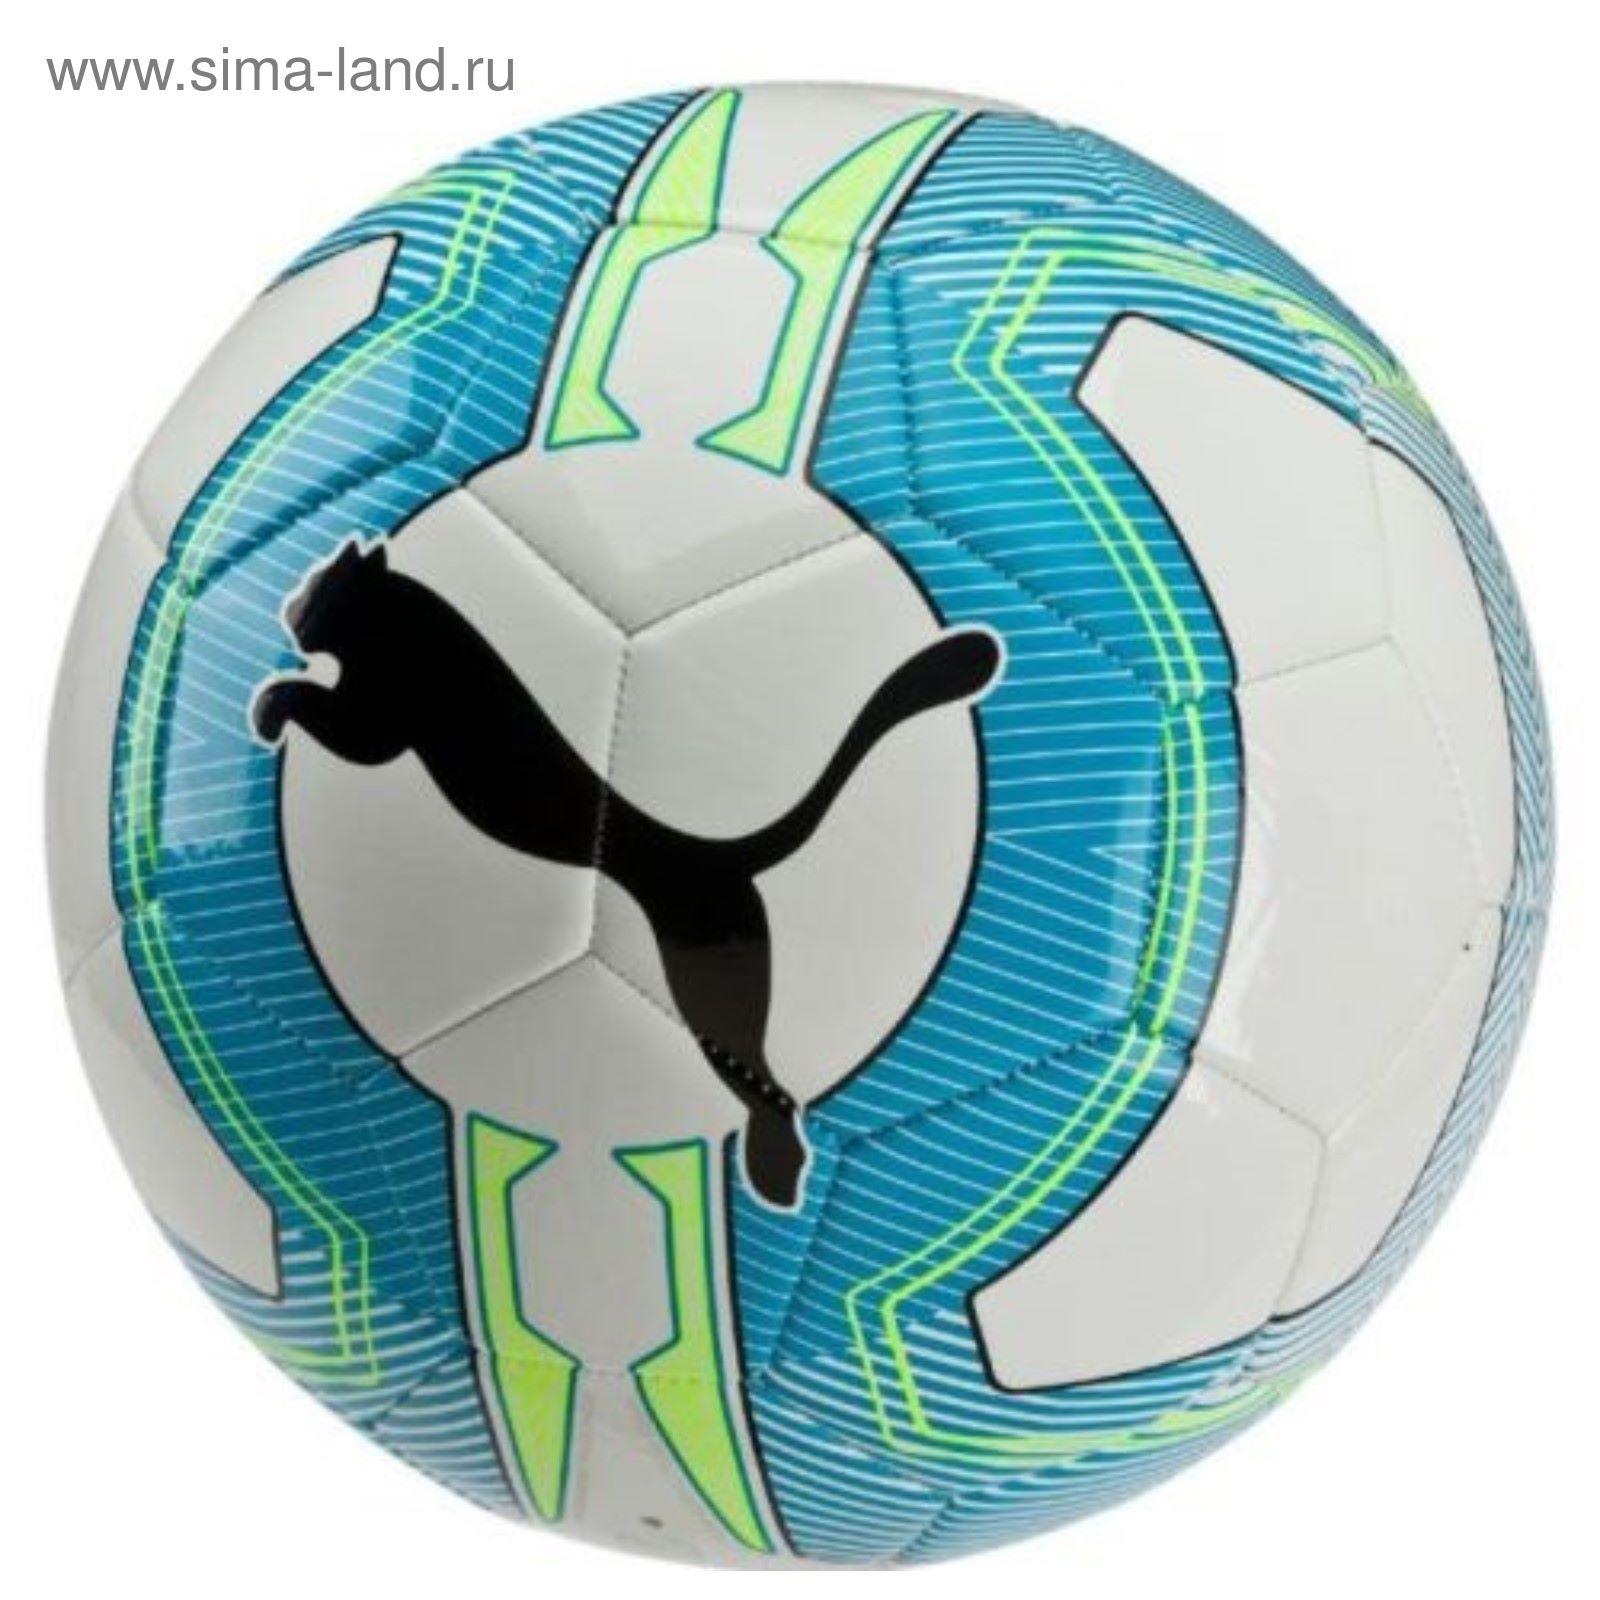 Мяч футбольный PUMA evoPOWER 5.3 Trainer HS (р.5) 8256201 (2350275 ... e8befa23cdaba